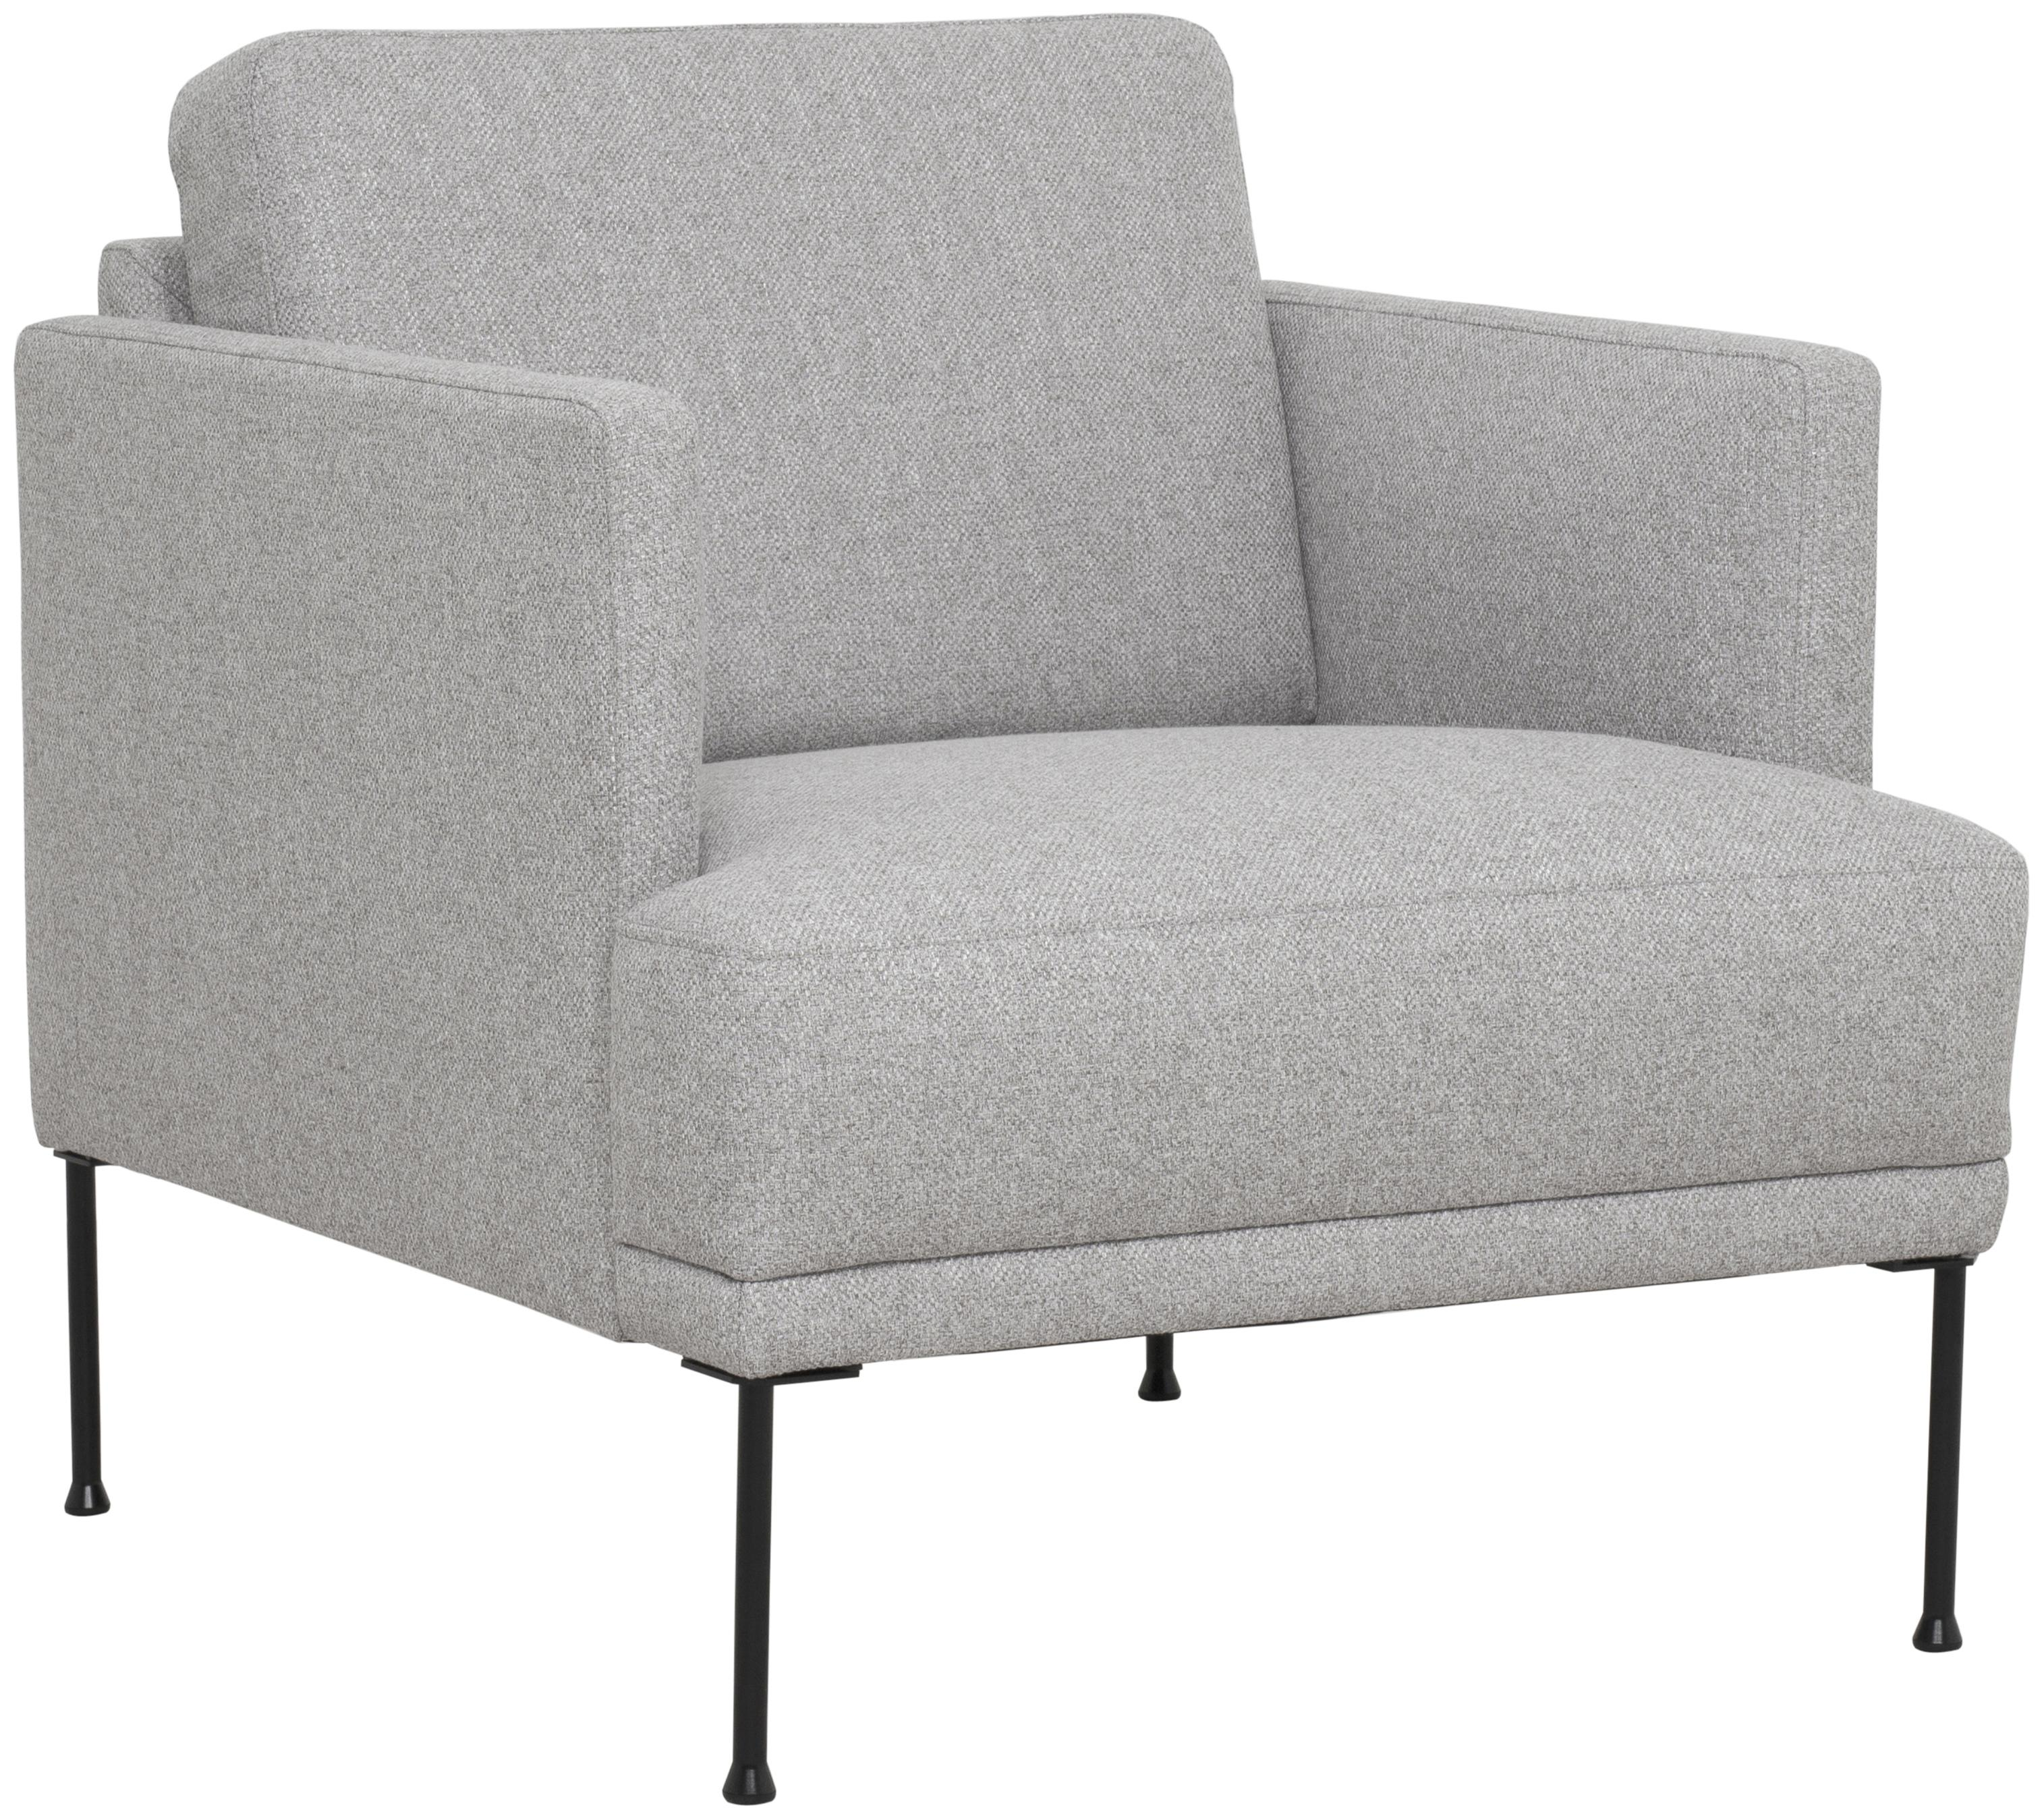 Sessel Fluente, Bezug: 80% Polyester, 20% Ramie , Gestell: Massives Kiefernholz, Füße: Metall, pulverbeschichtet, Webstoff Hellgrau, B 74 x T 85 cm